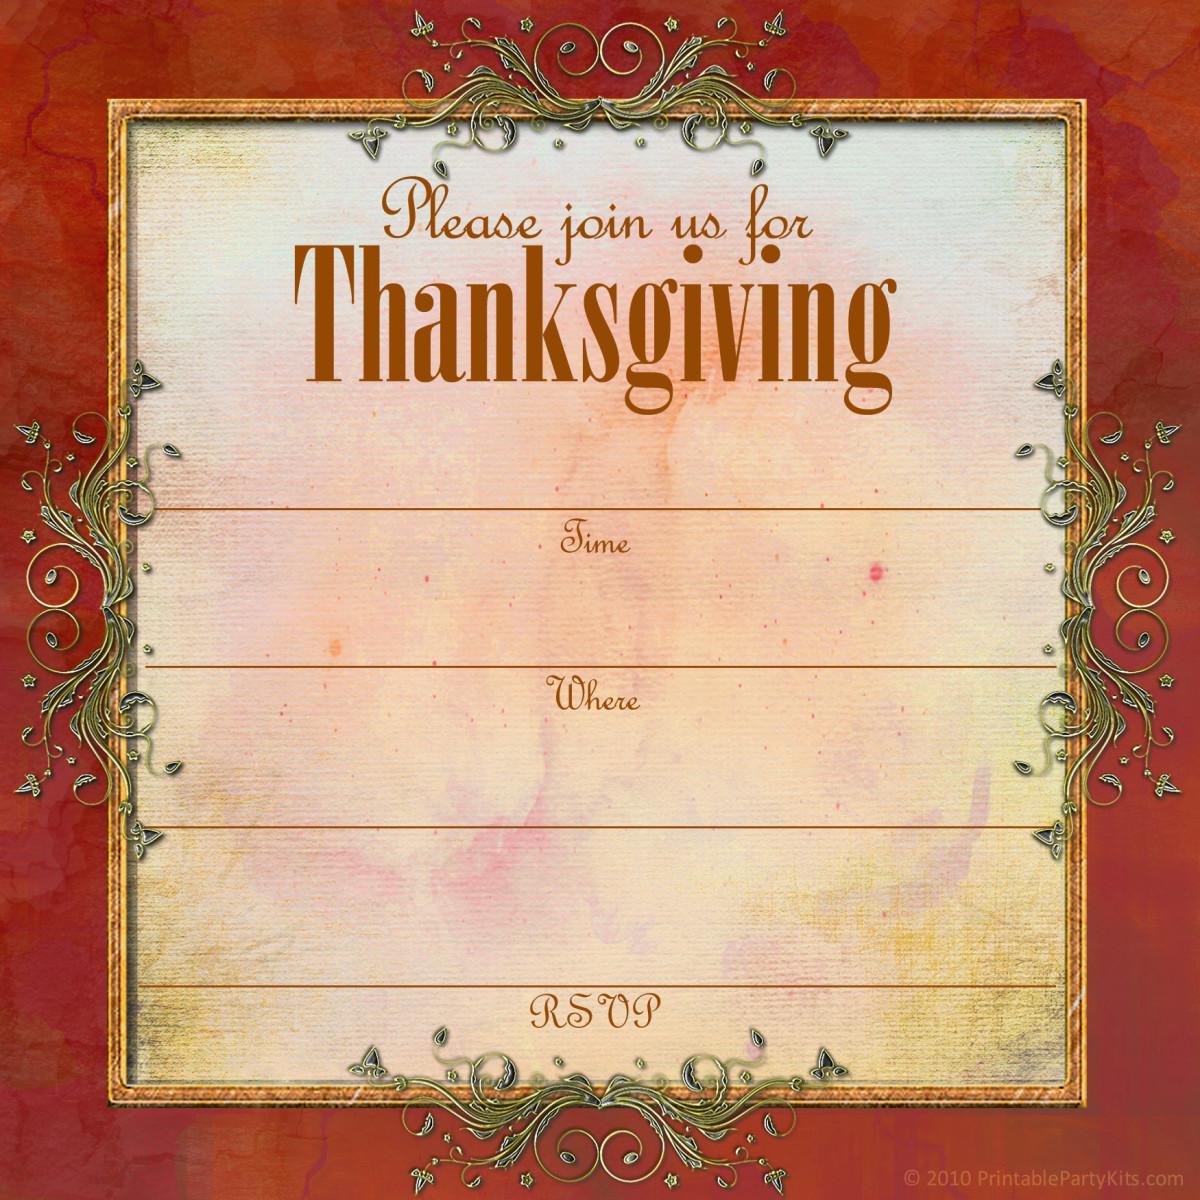 Ornate filigree Thanksgiving invitation template